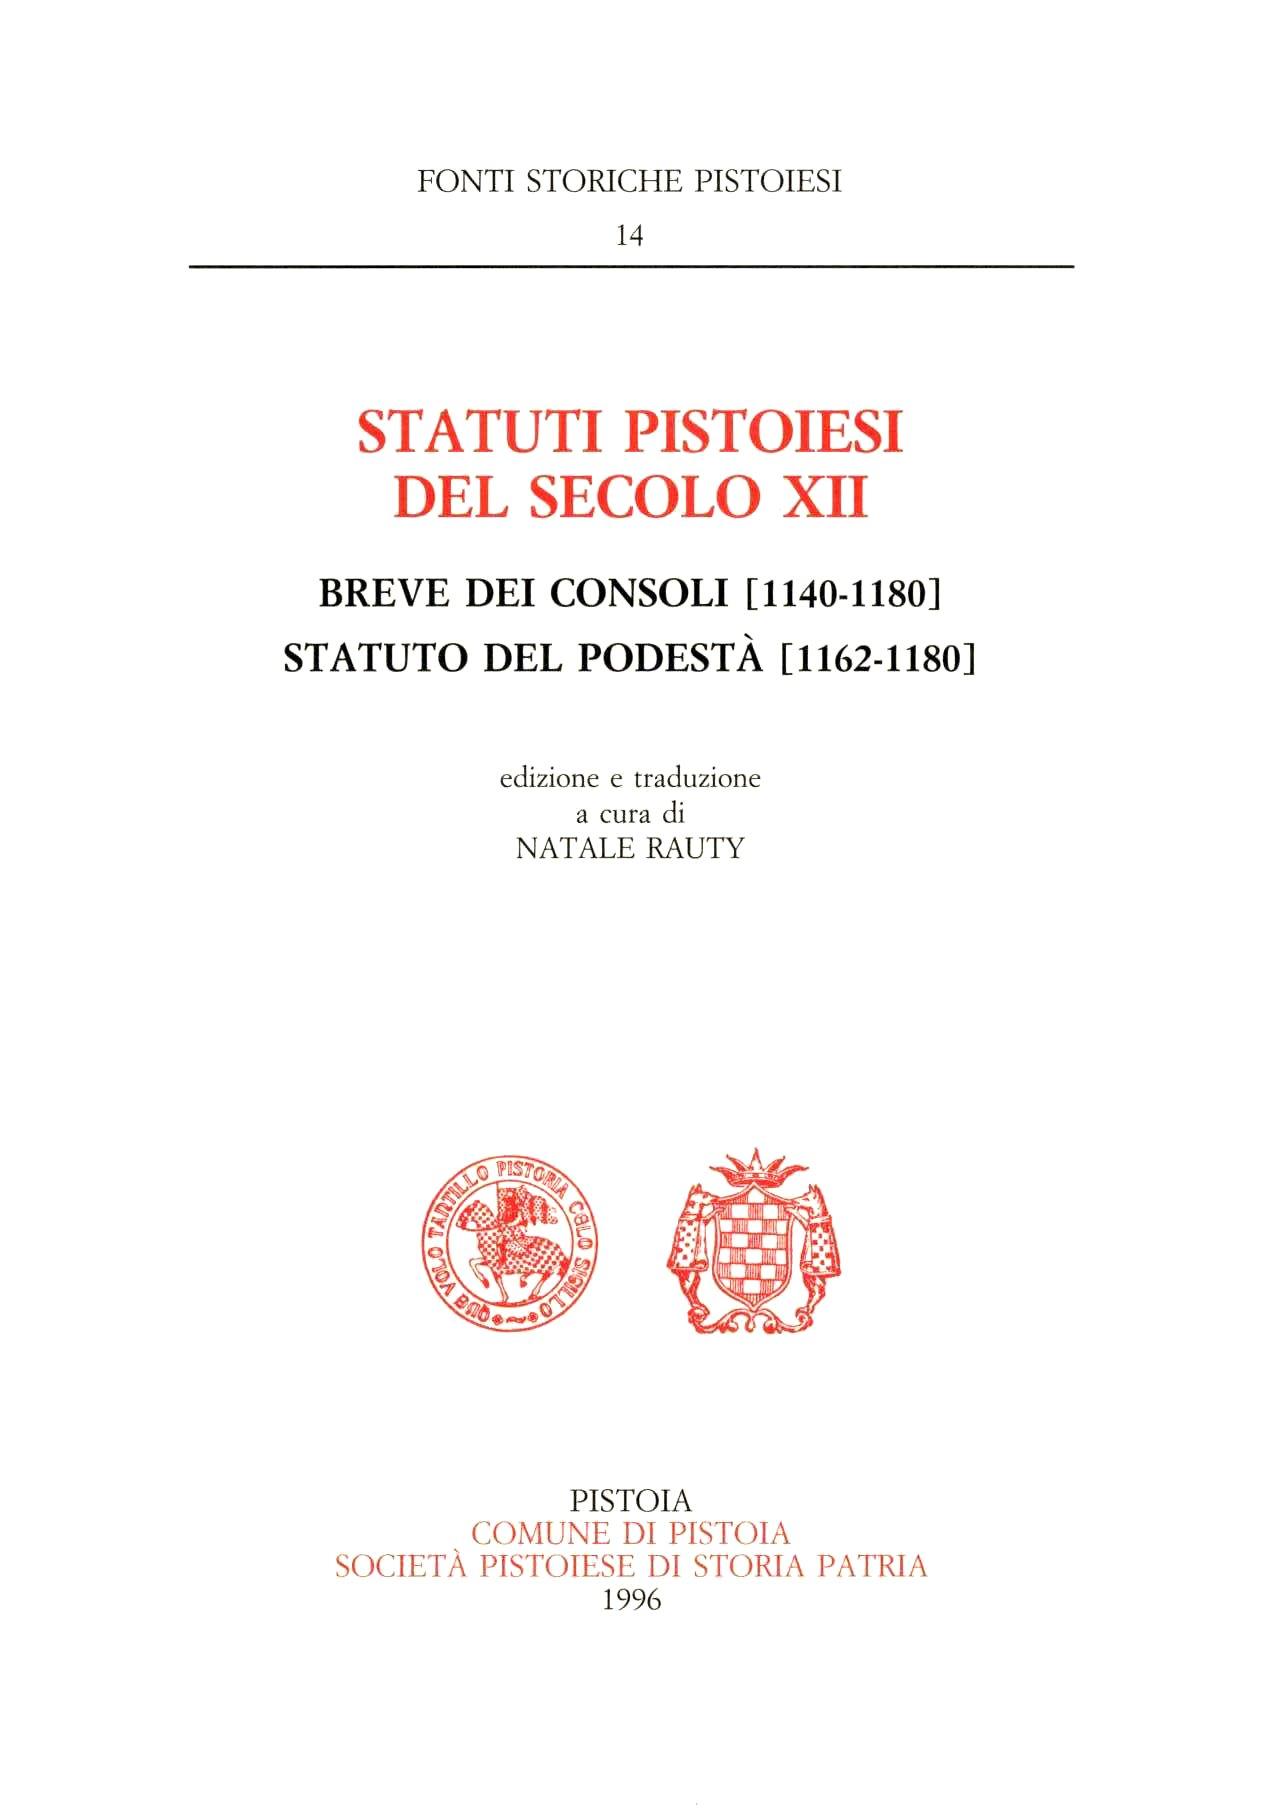 statuti pistoiesi del sec.XII 0001.jpg